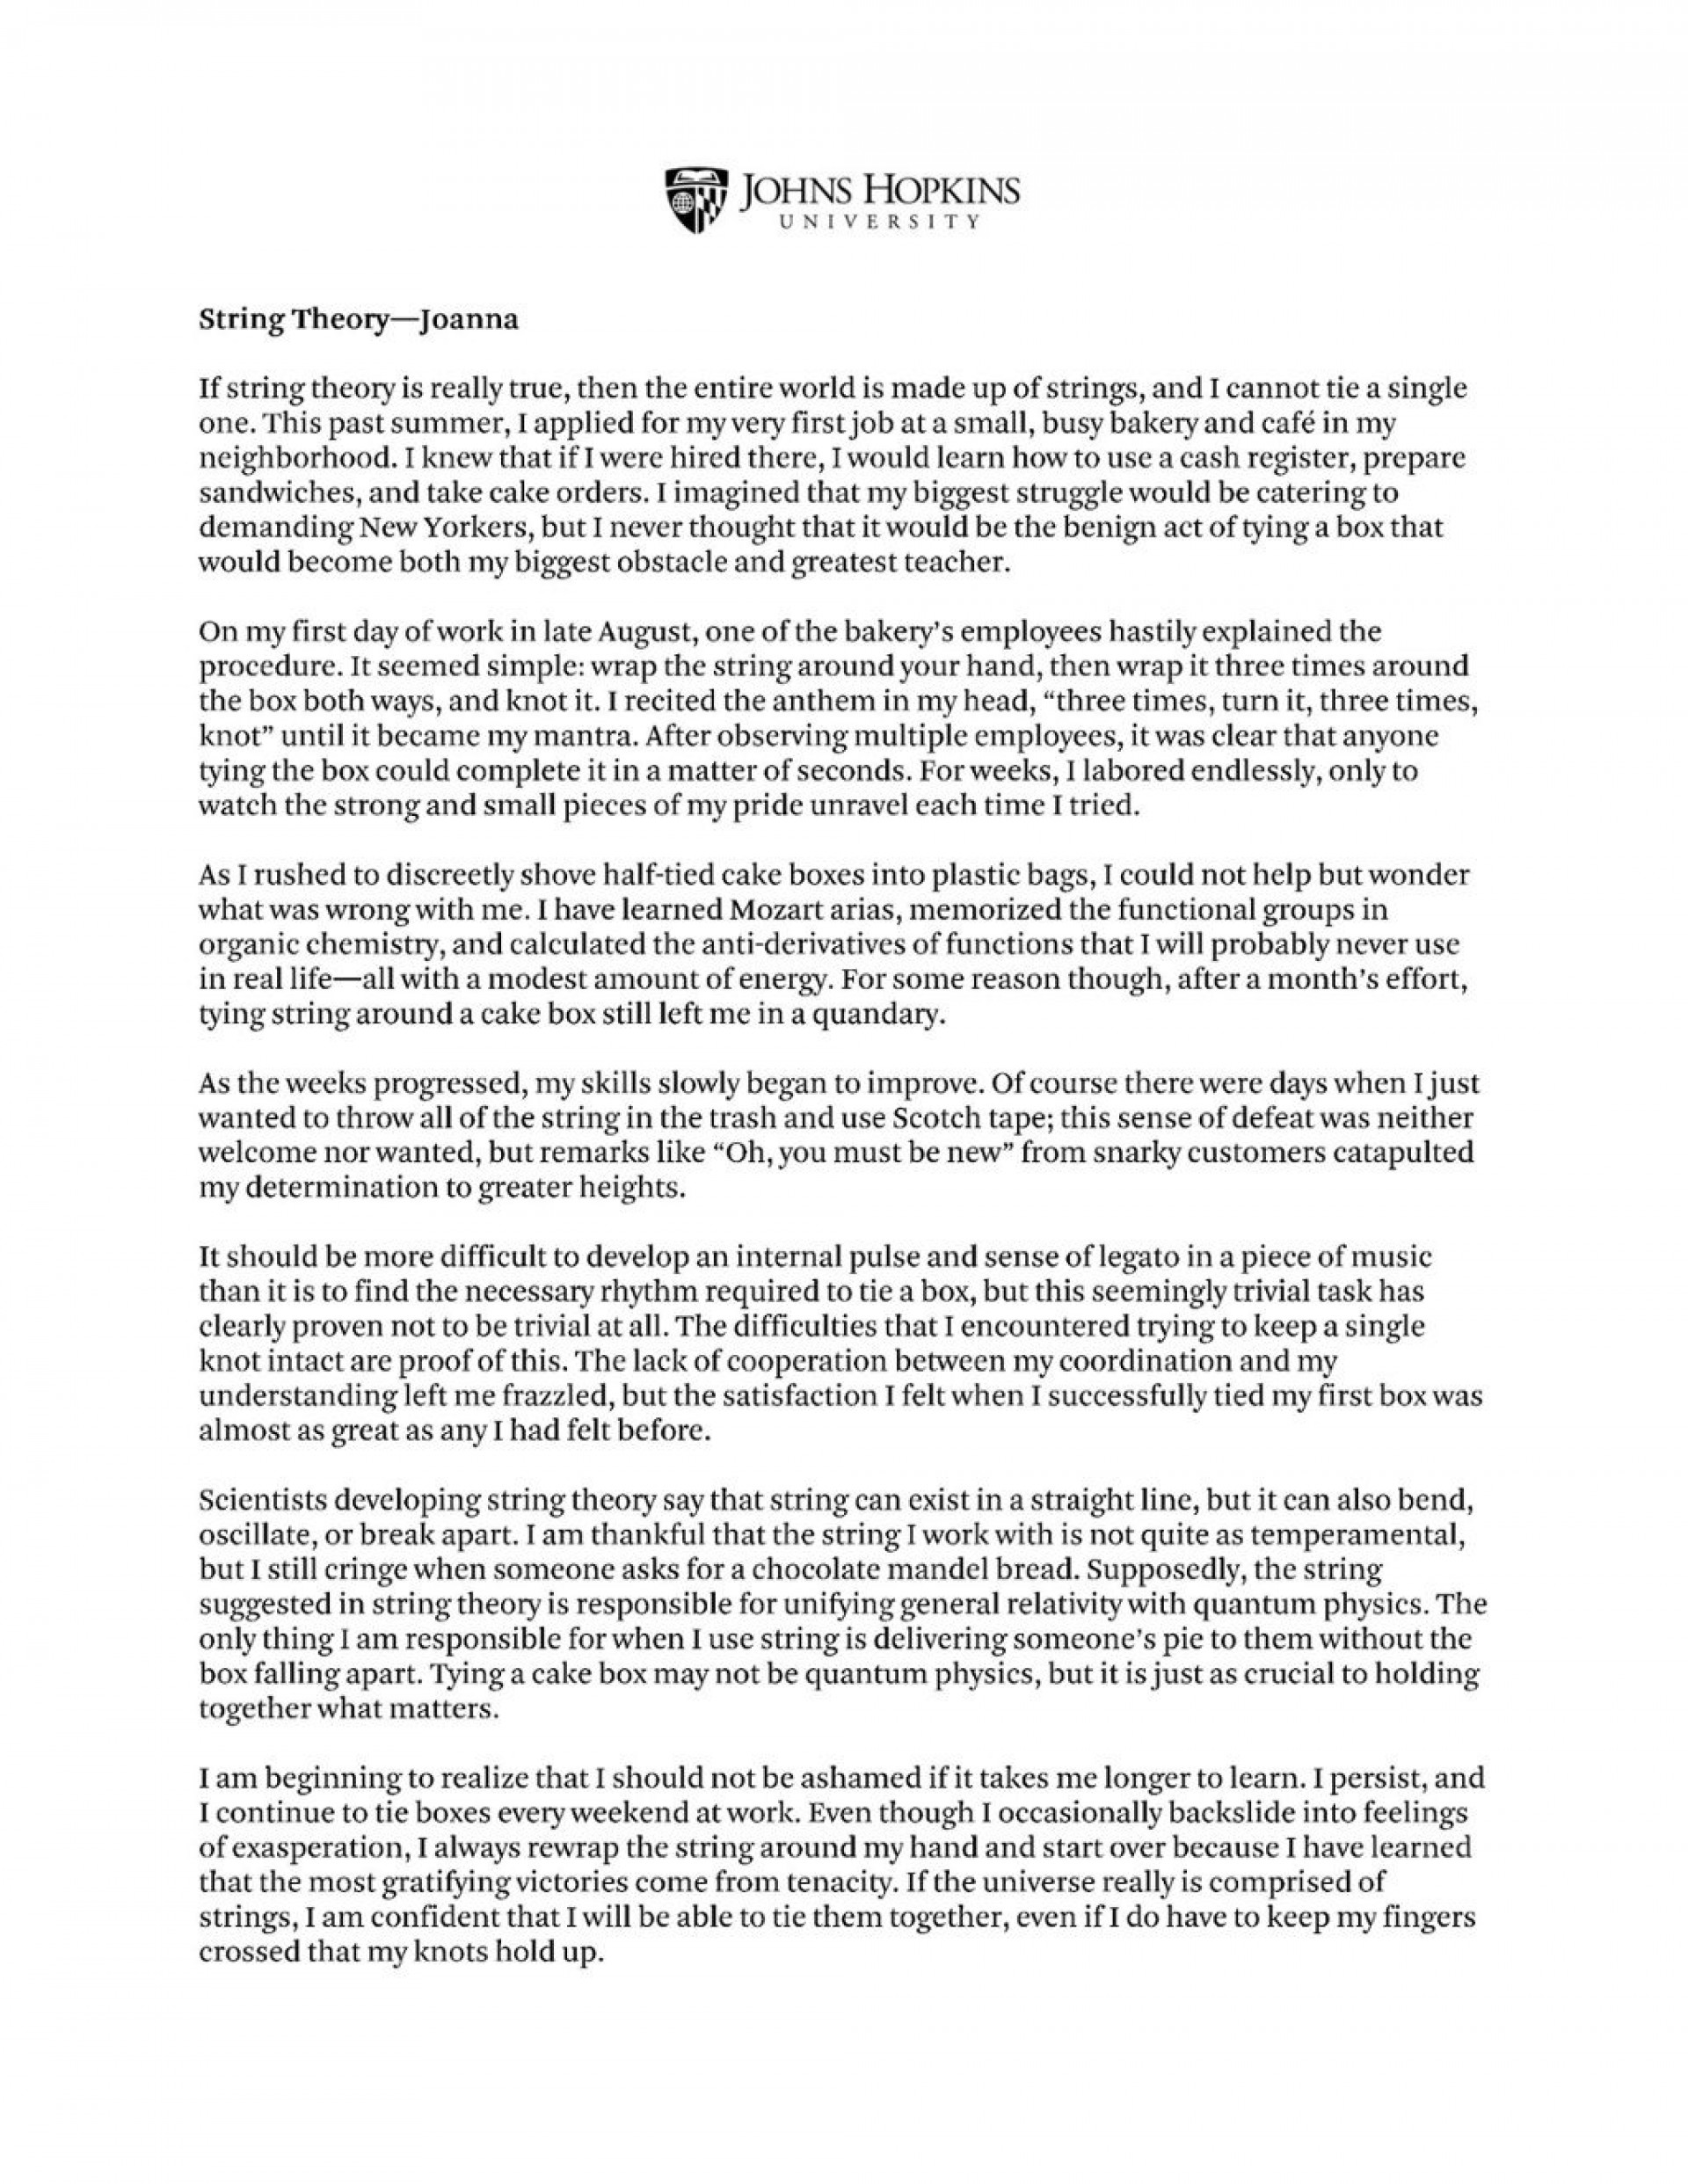 001 Jhu Essays That Worked Essay Wonderful 2019 Johns Hopkins 1920